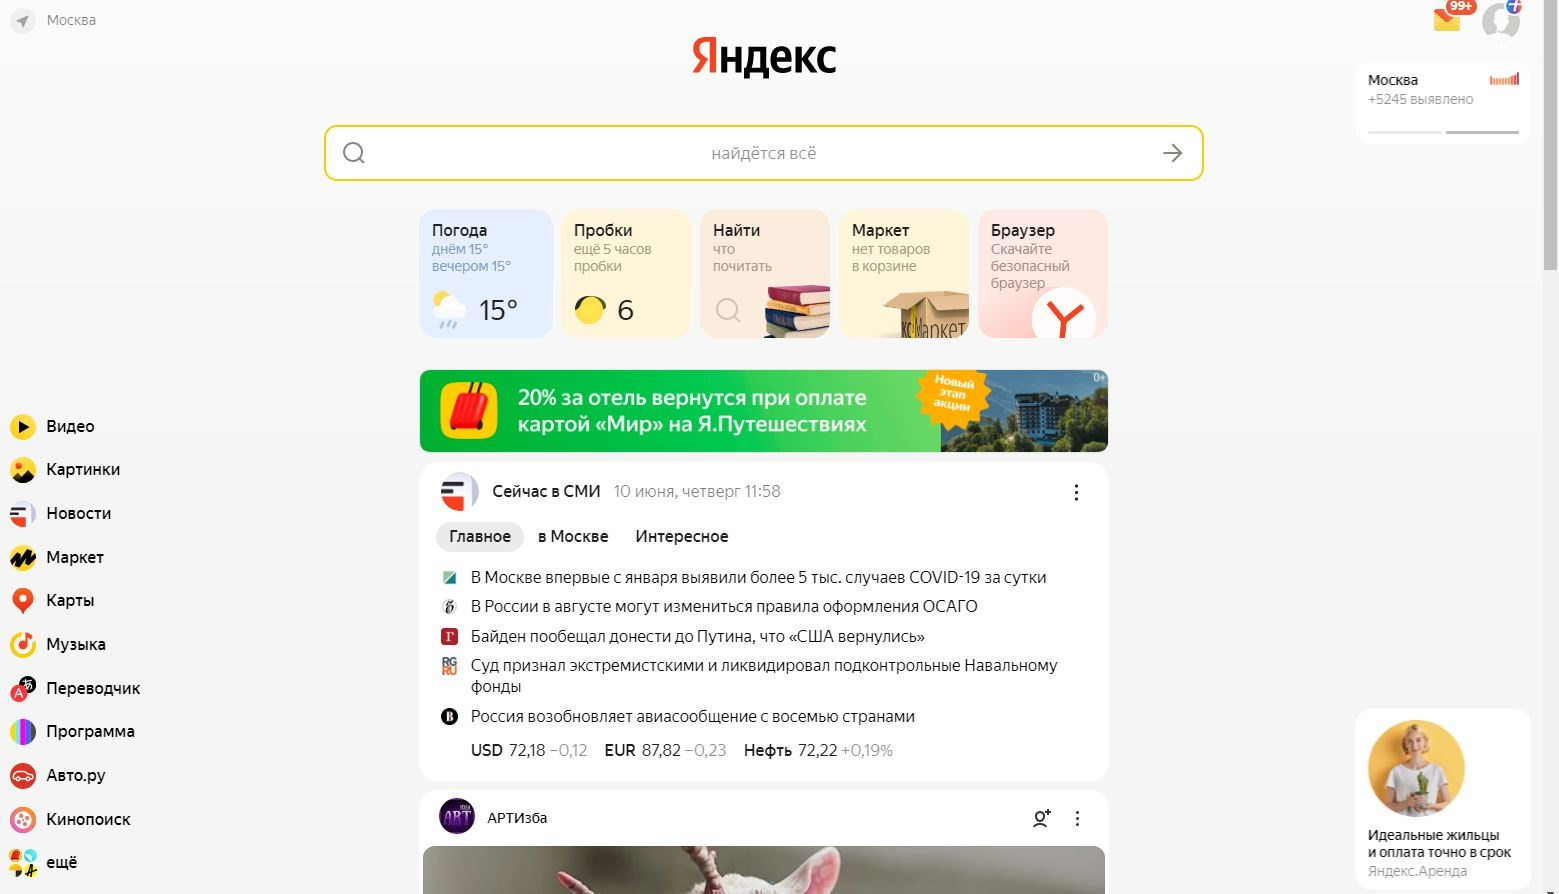 «Яндекс» масштабно обновил поиск и главную страницу